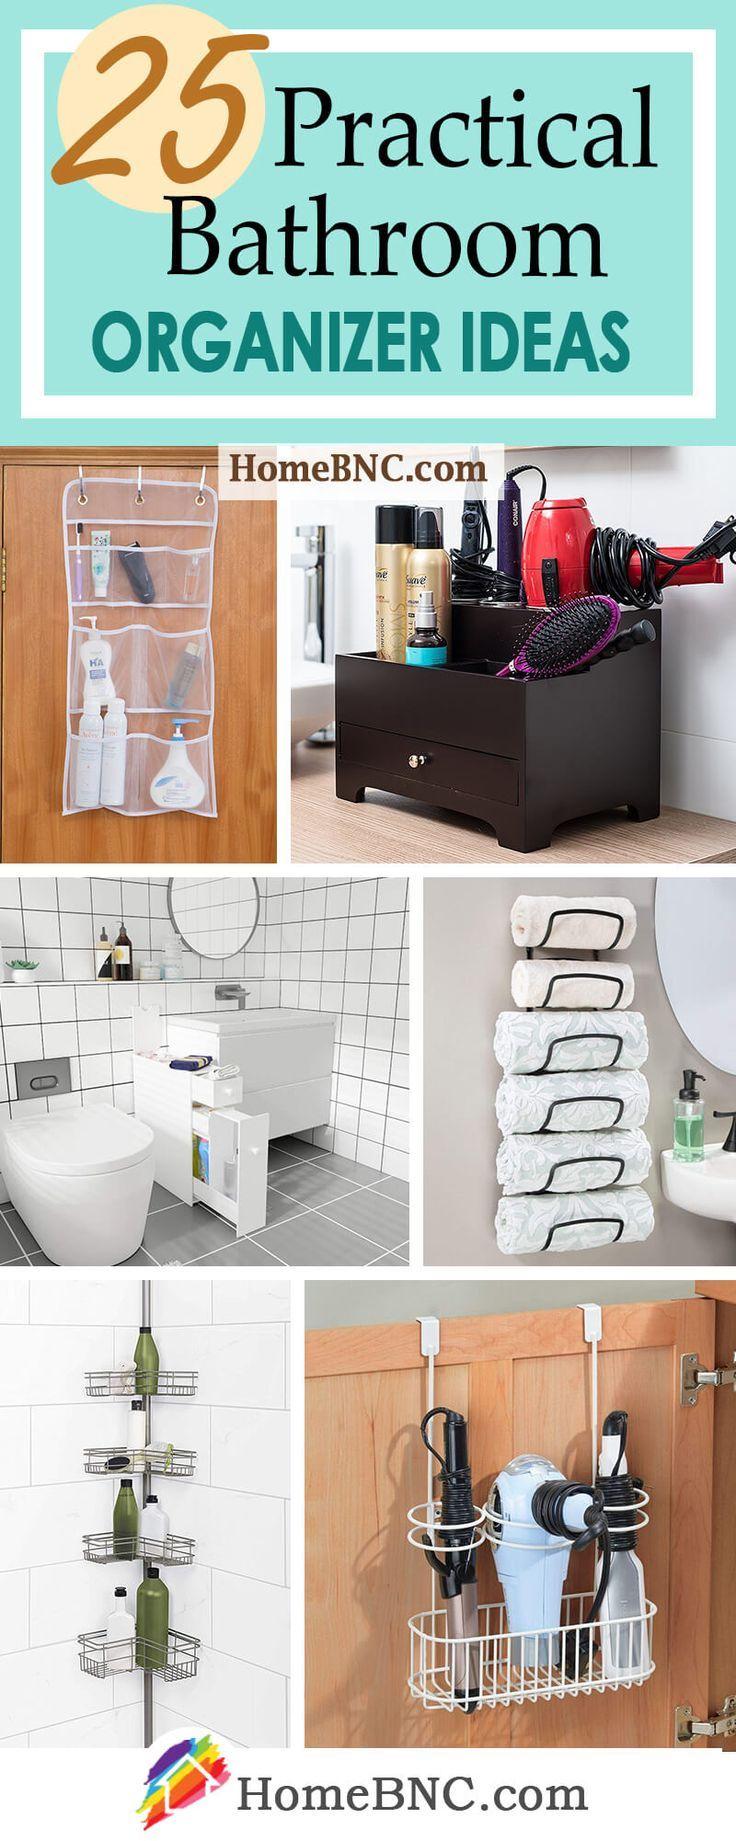 Easy And Affordable Diy Bathroom Organizer Ideas To Keep In Mind Top Cool Diy Bathroom Organisation Bathroom Organization Diy Bathroom Organization Practical bathroom organization ideas